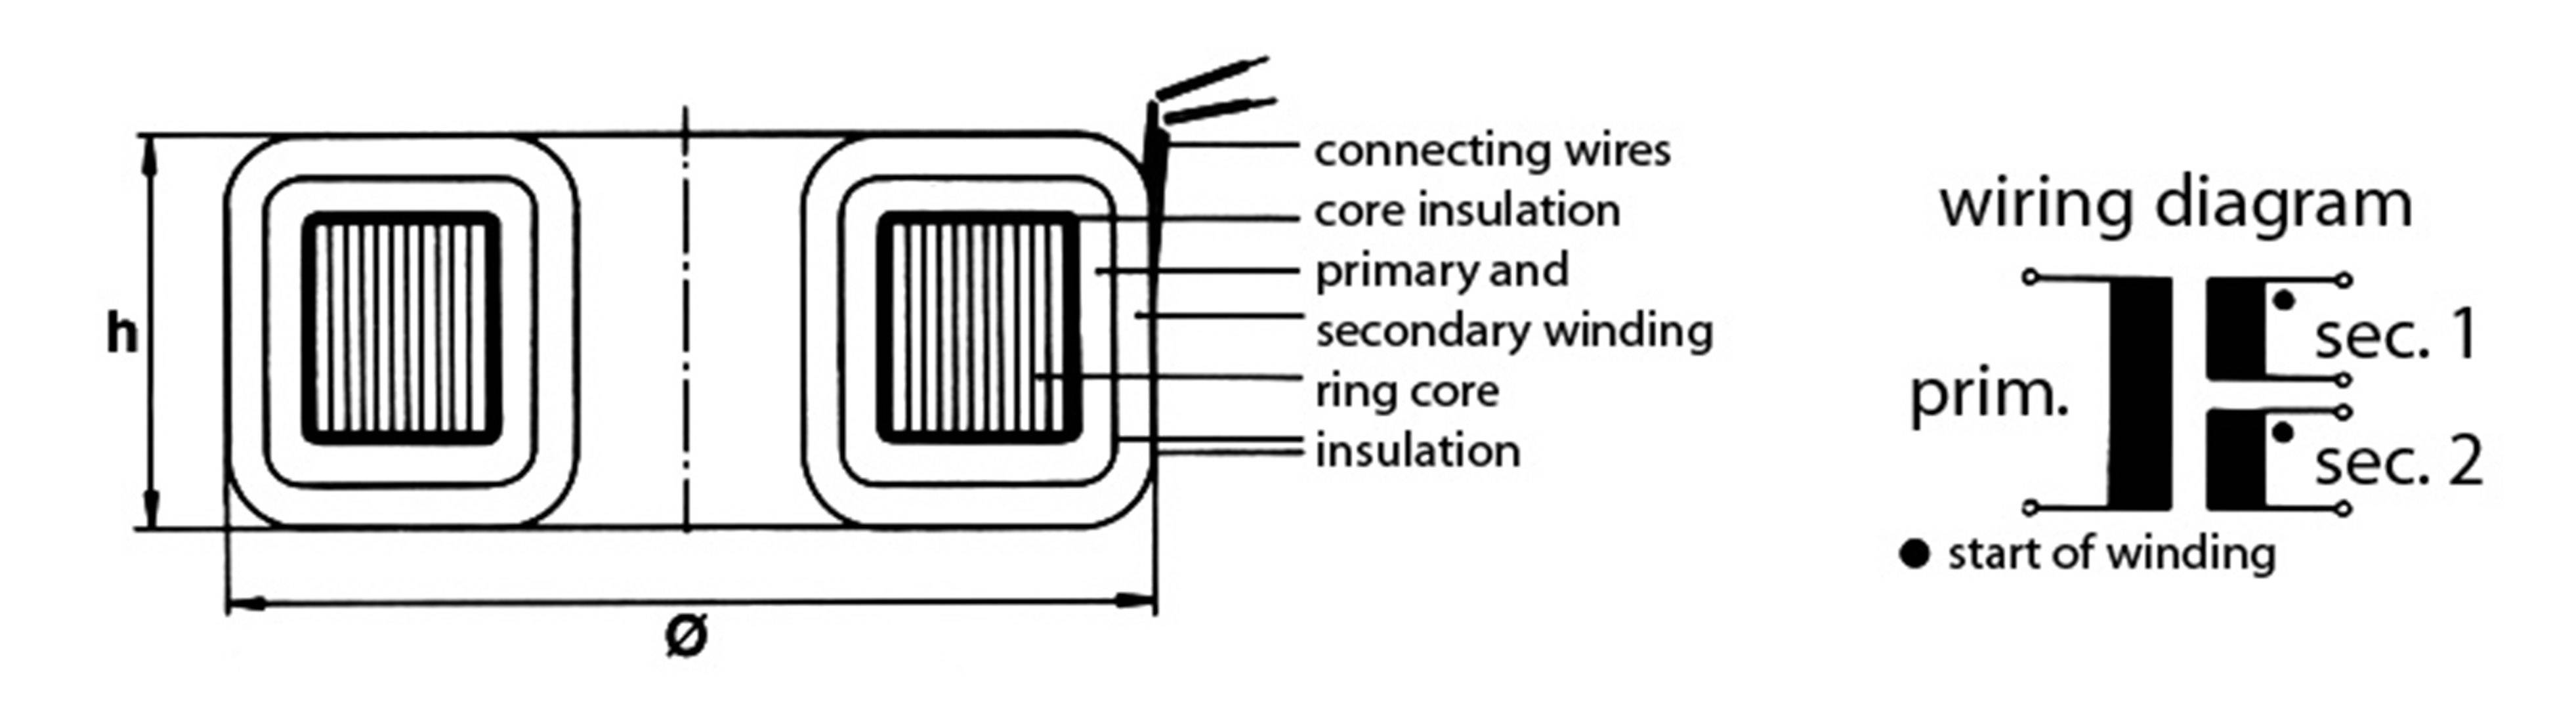 2x15 wiring diagram wiring diagram paper cd15 new racing cdi wiring diagram [ 3925 x 1082 Pixel ]